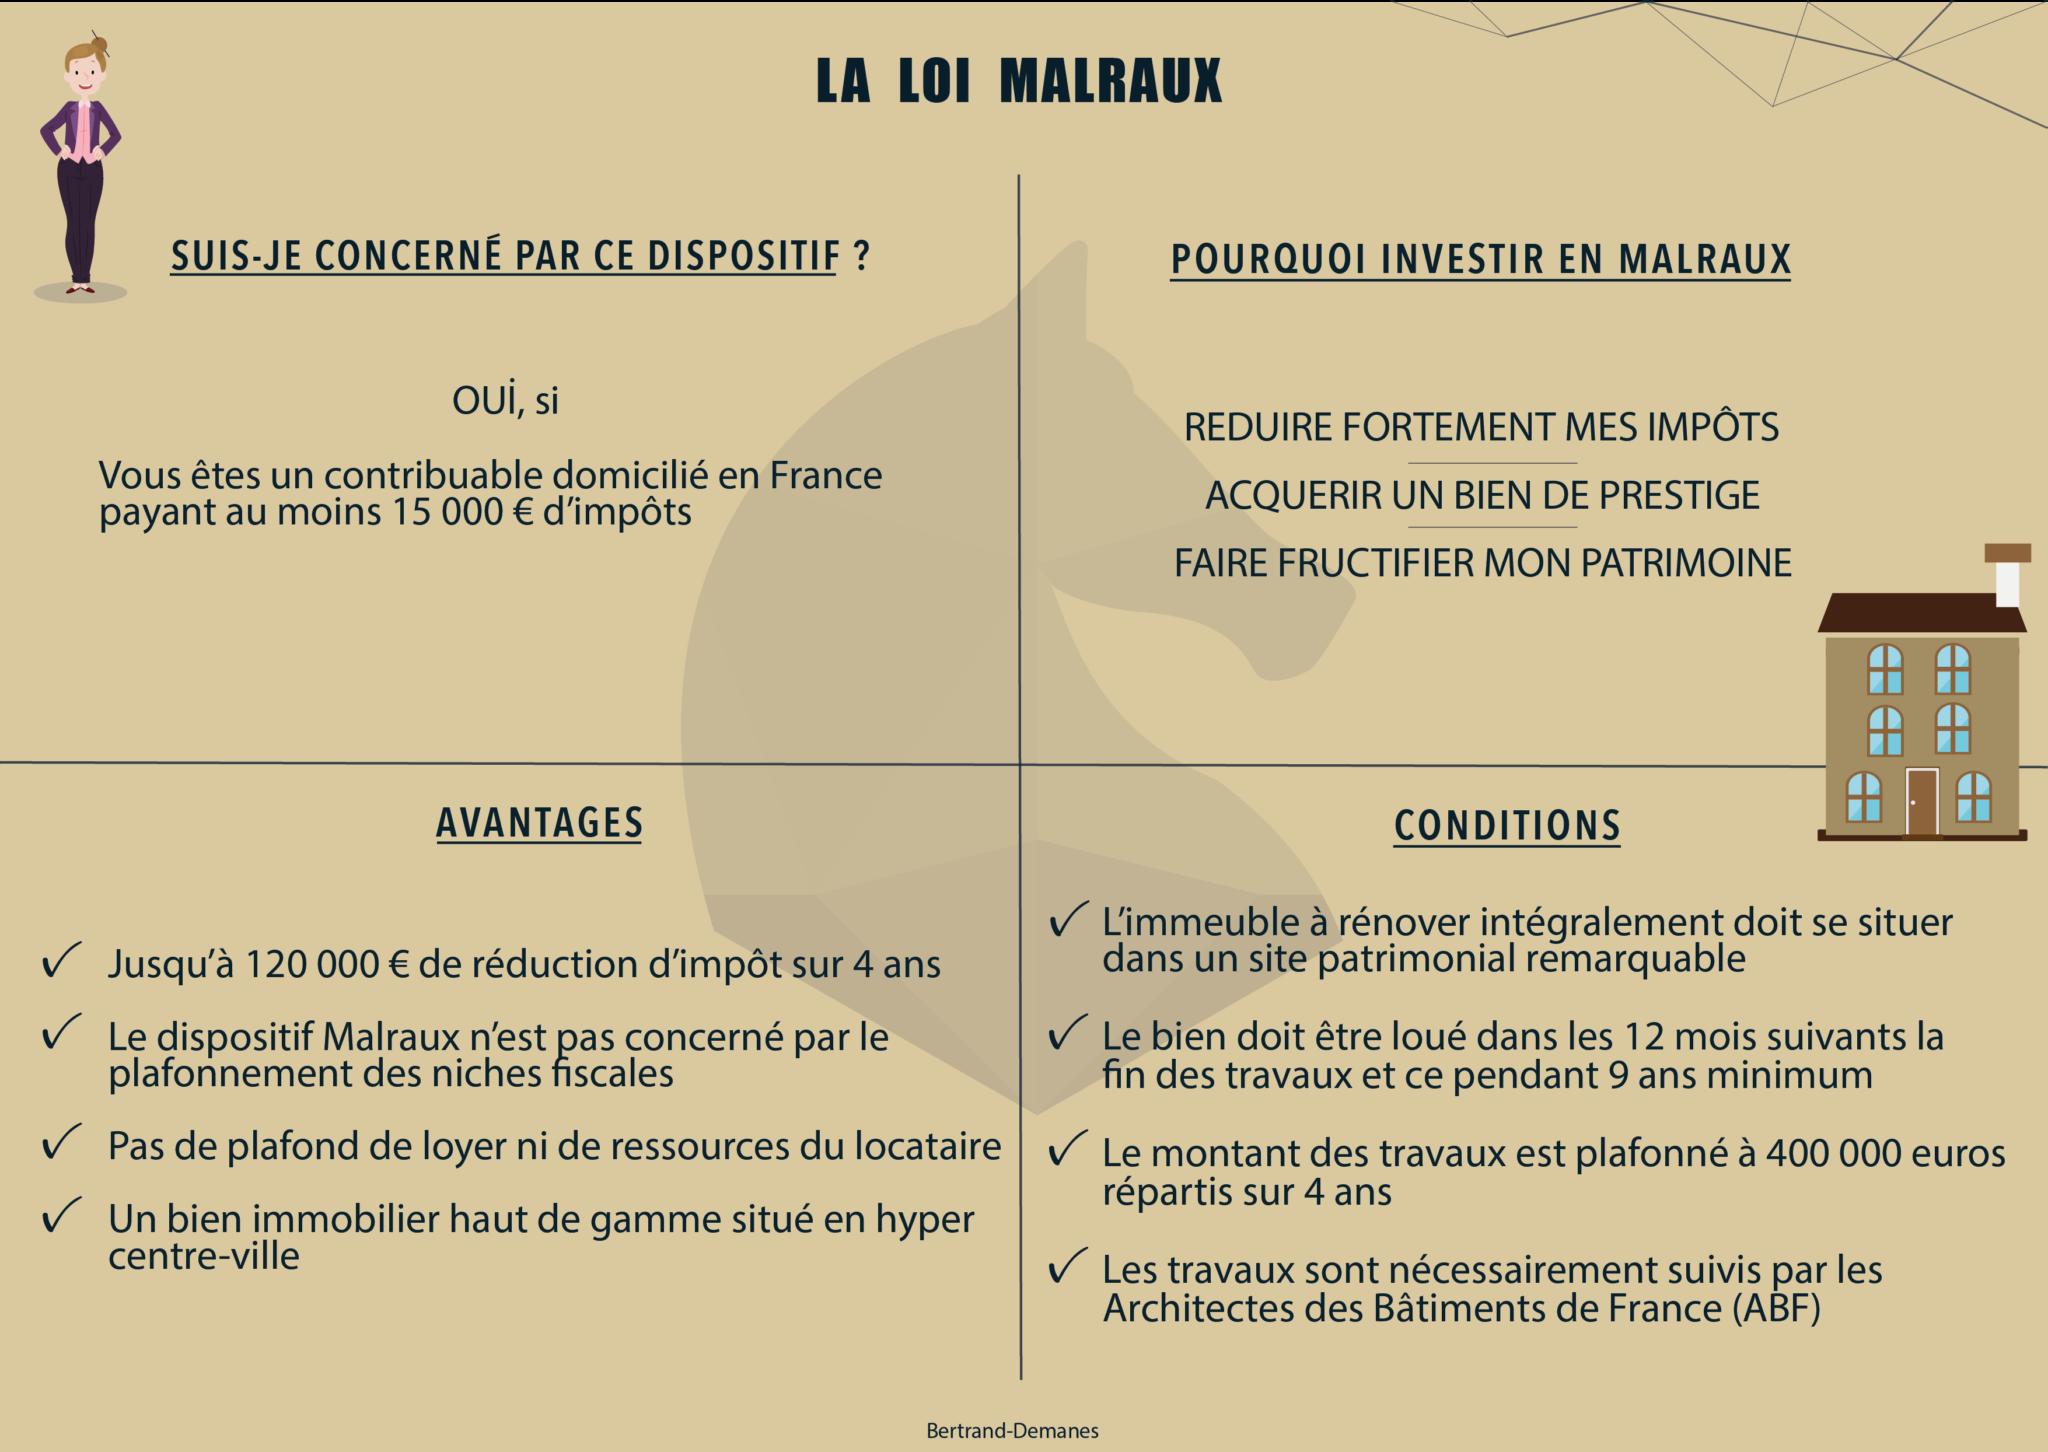 infographie-loi-malraux-la-rochelle-bertrand-demanes